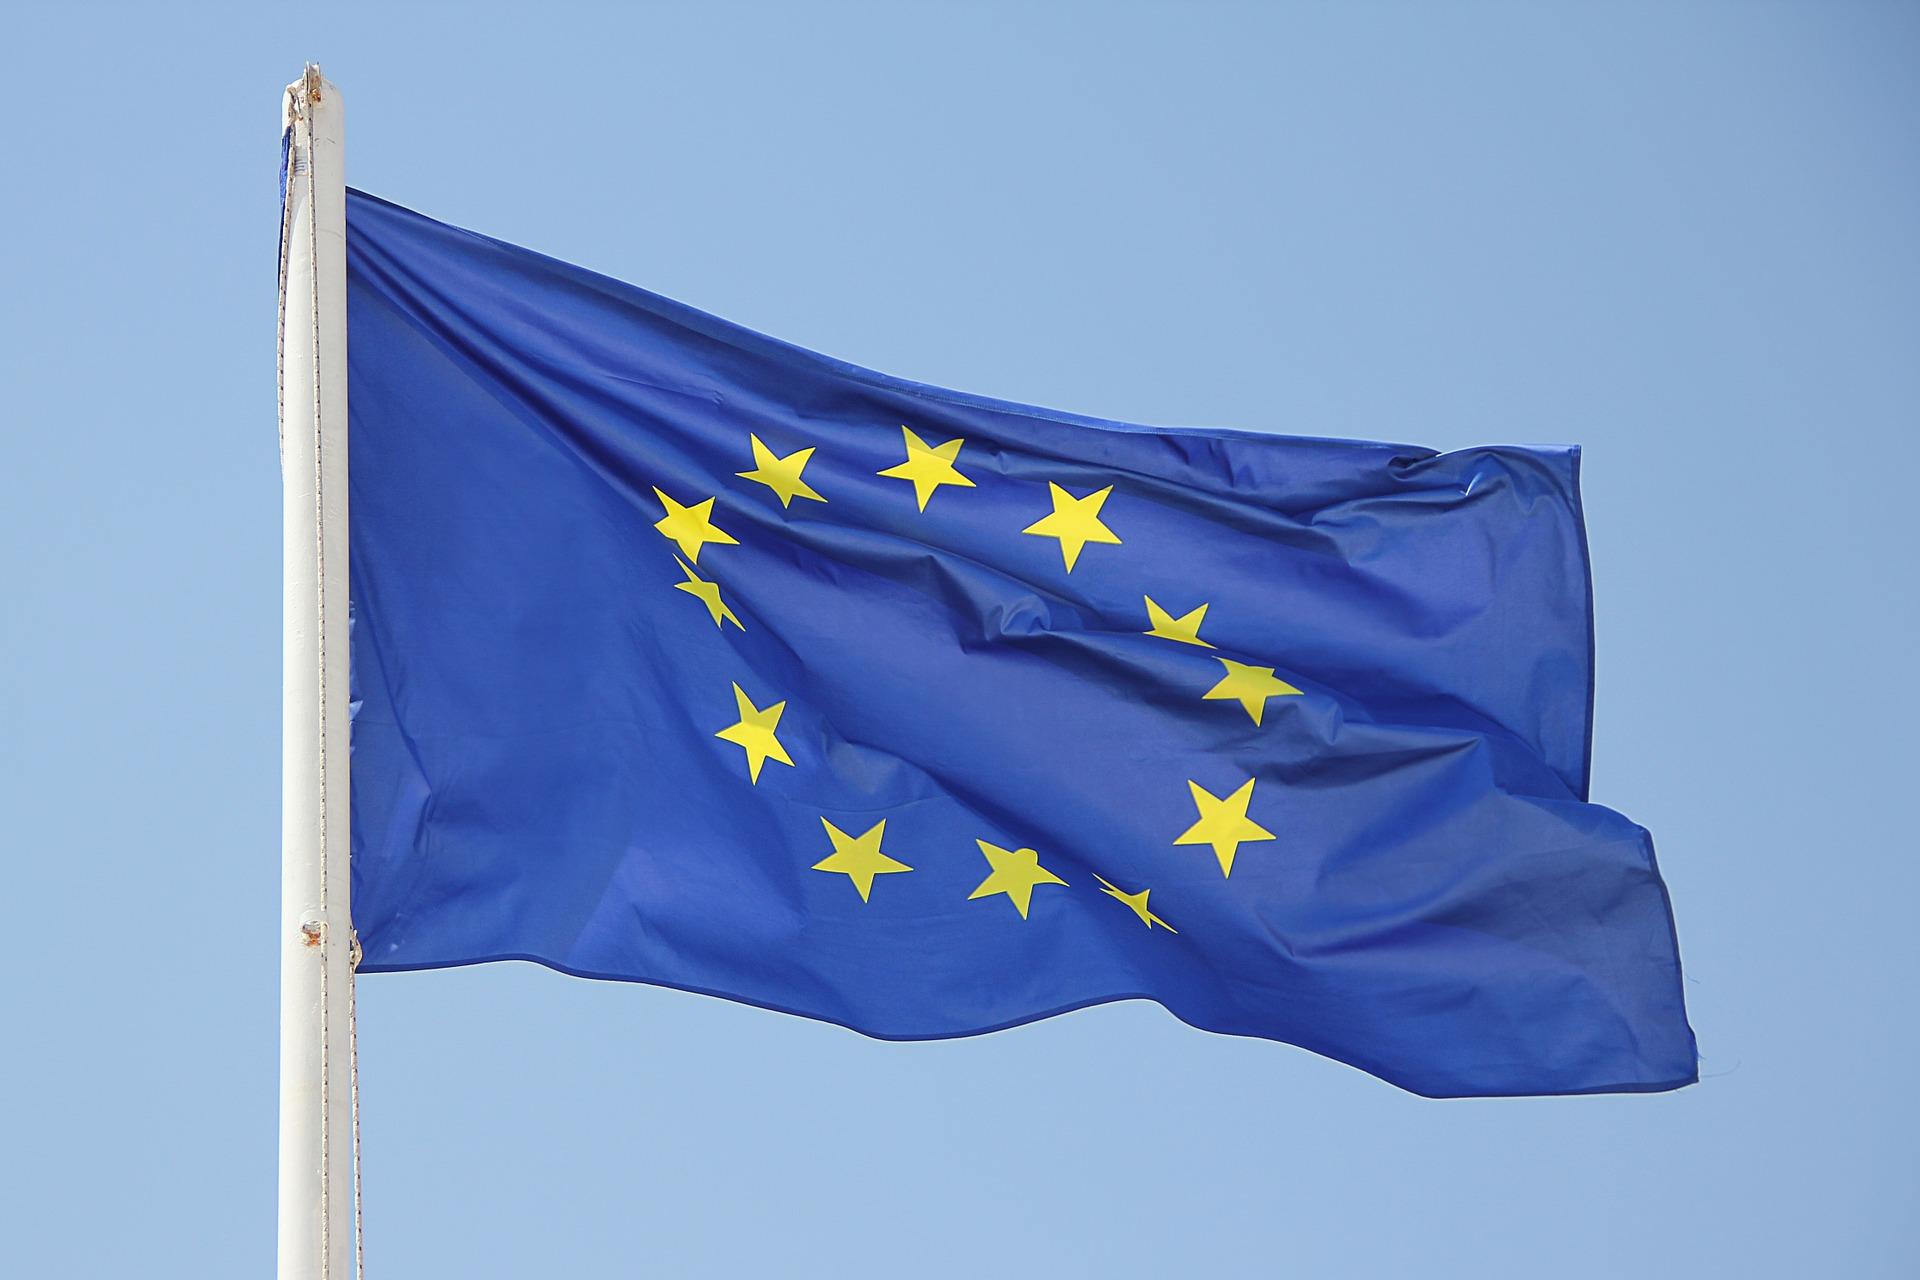 europe-1395913_1920.jpg